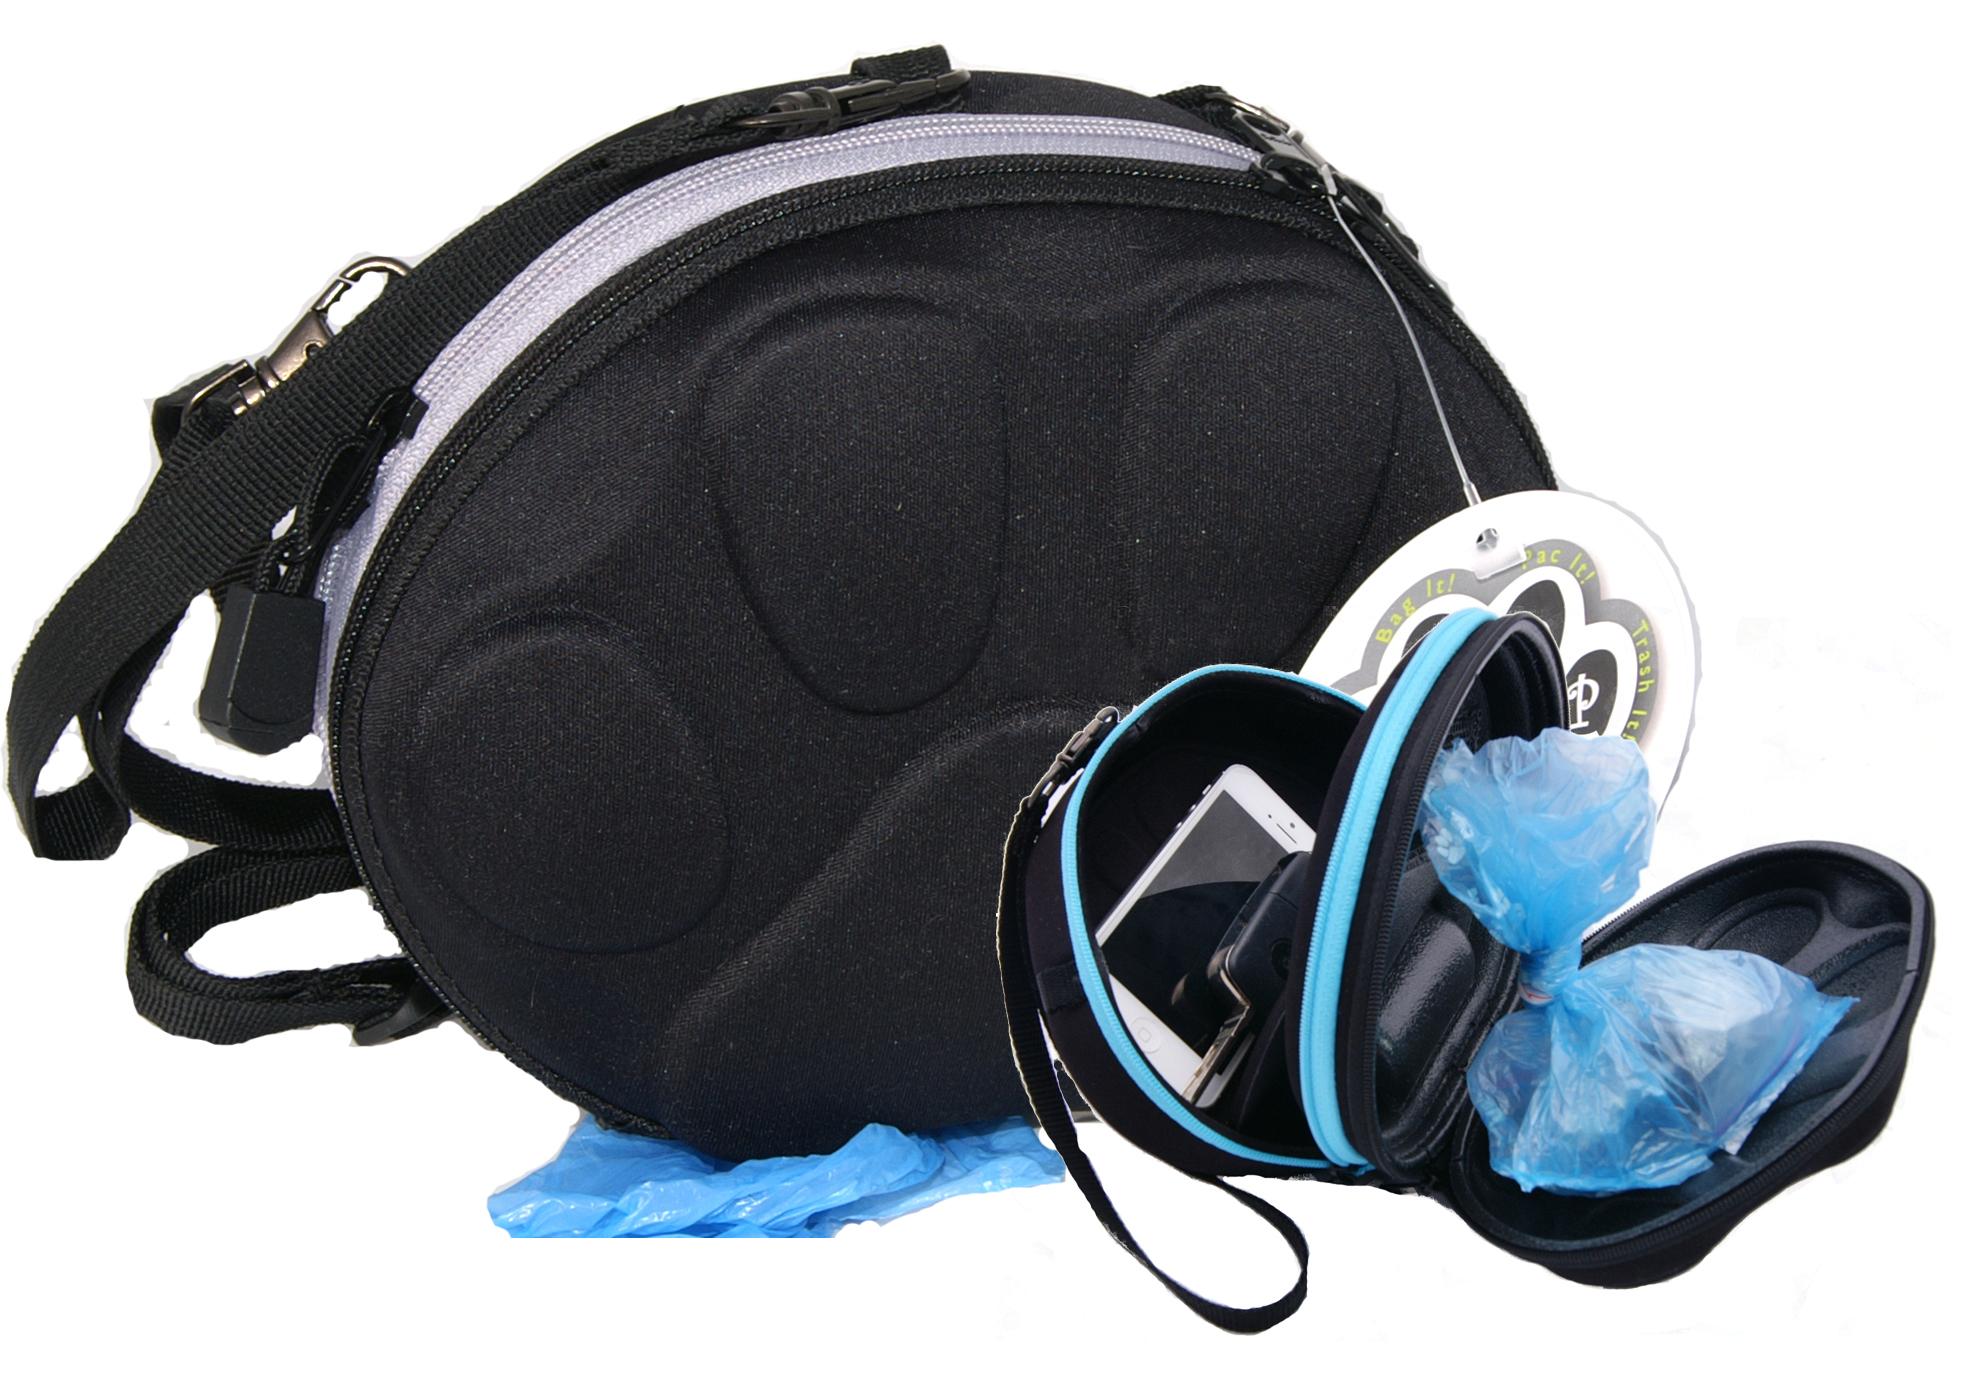 PoopPac Dog Waste Bag Holder